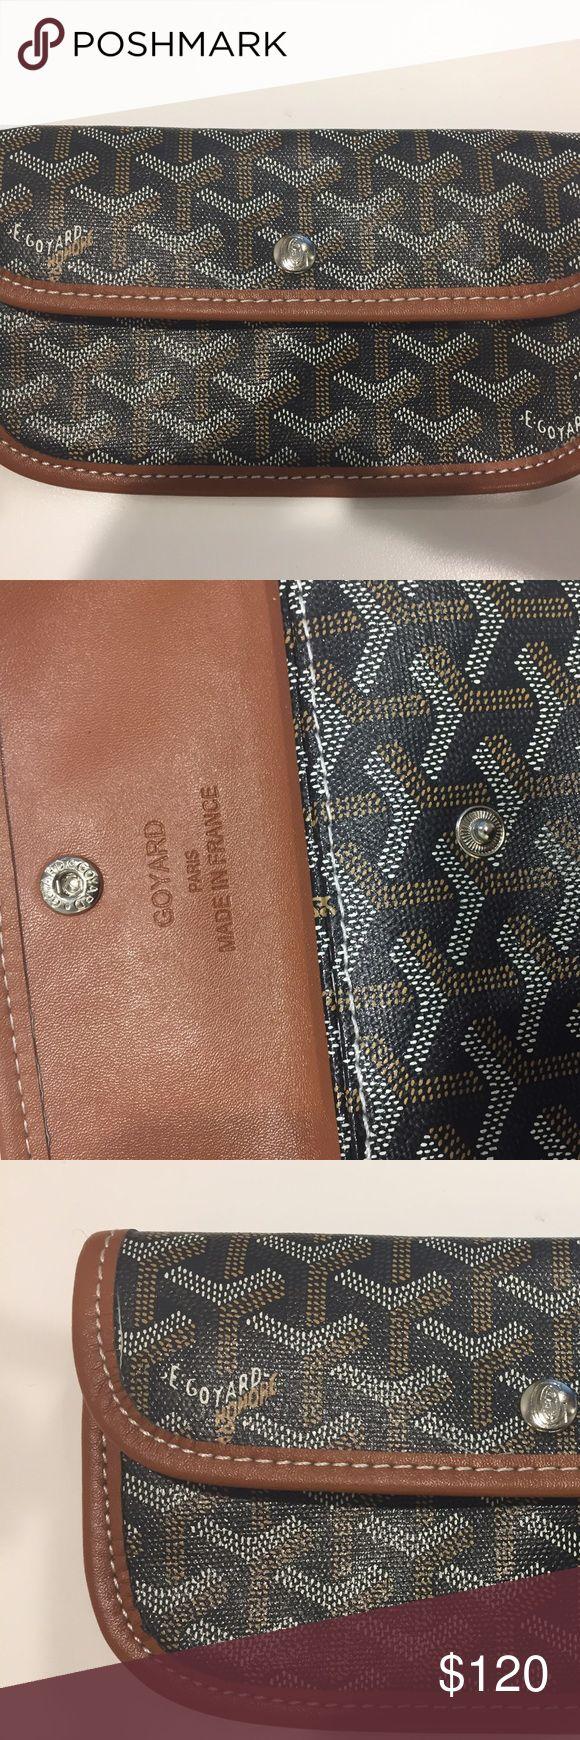 Goyard Wallet / Pouch Black/ brown goyard pouch wallet with snap close Goyard Bags Wallets